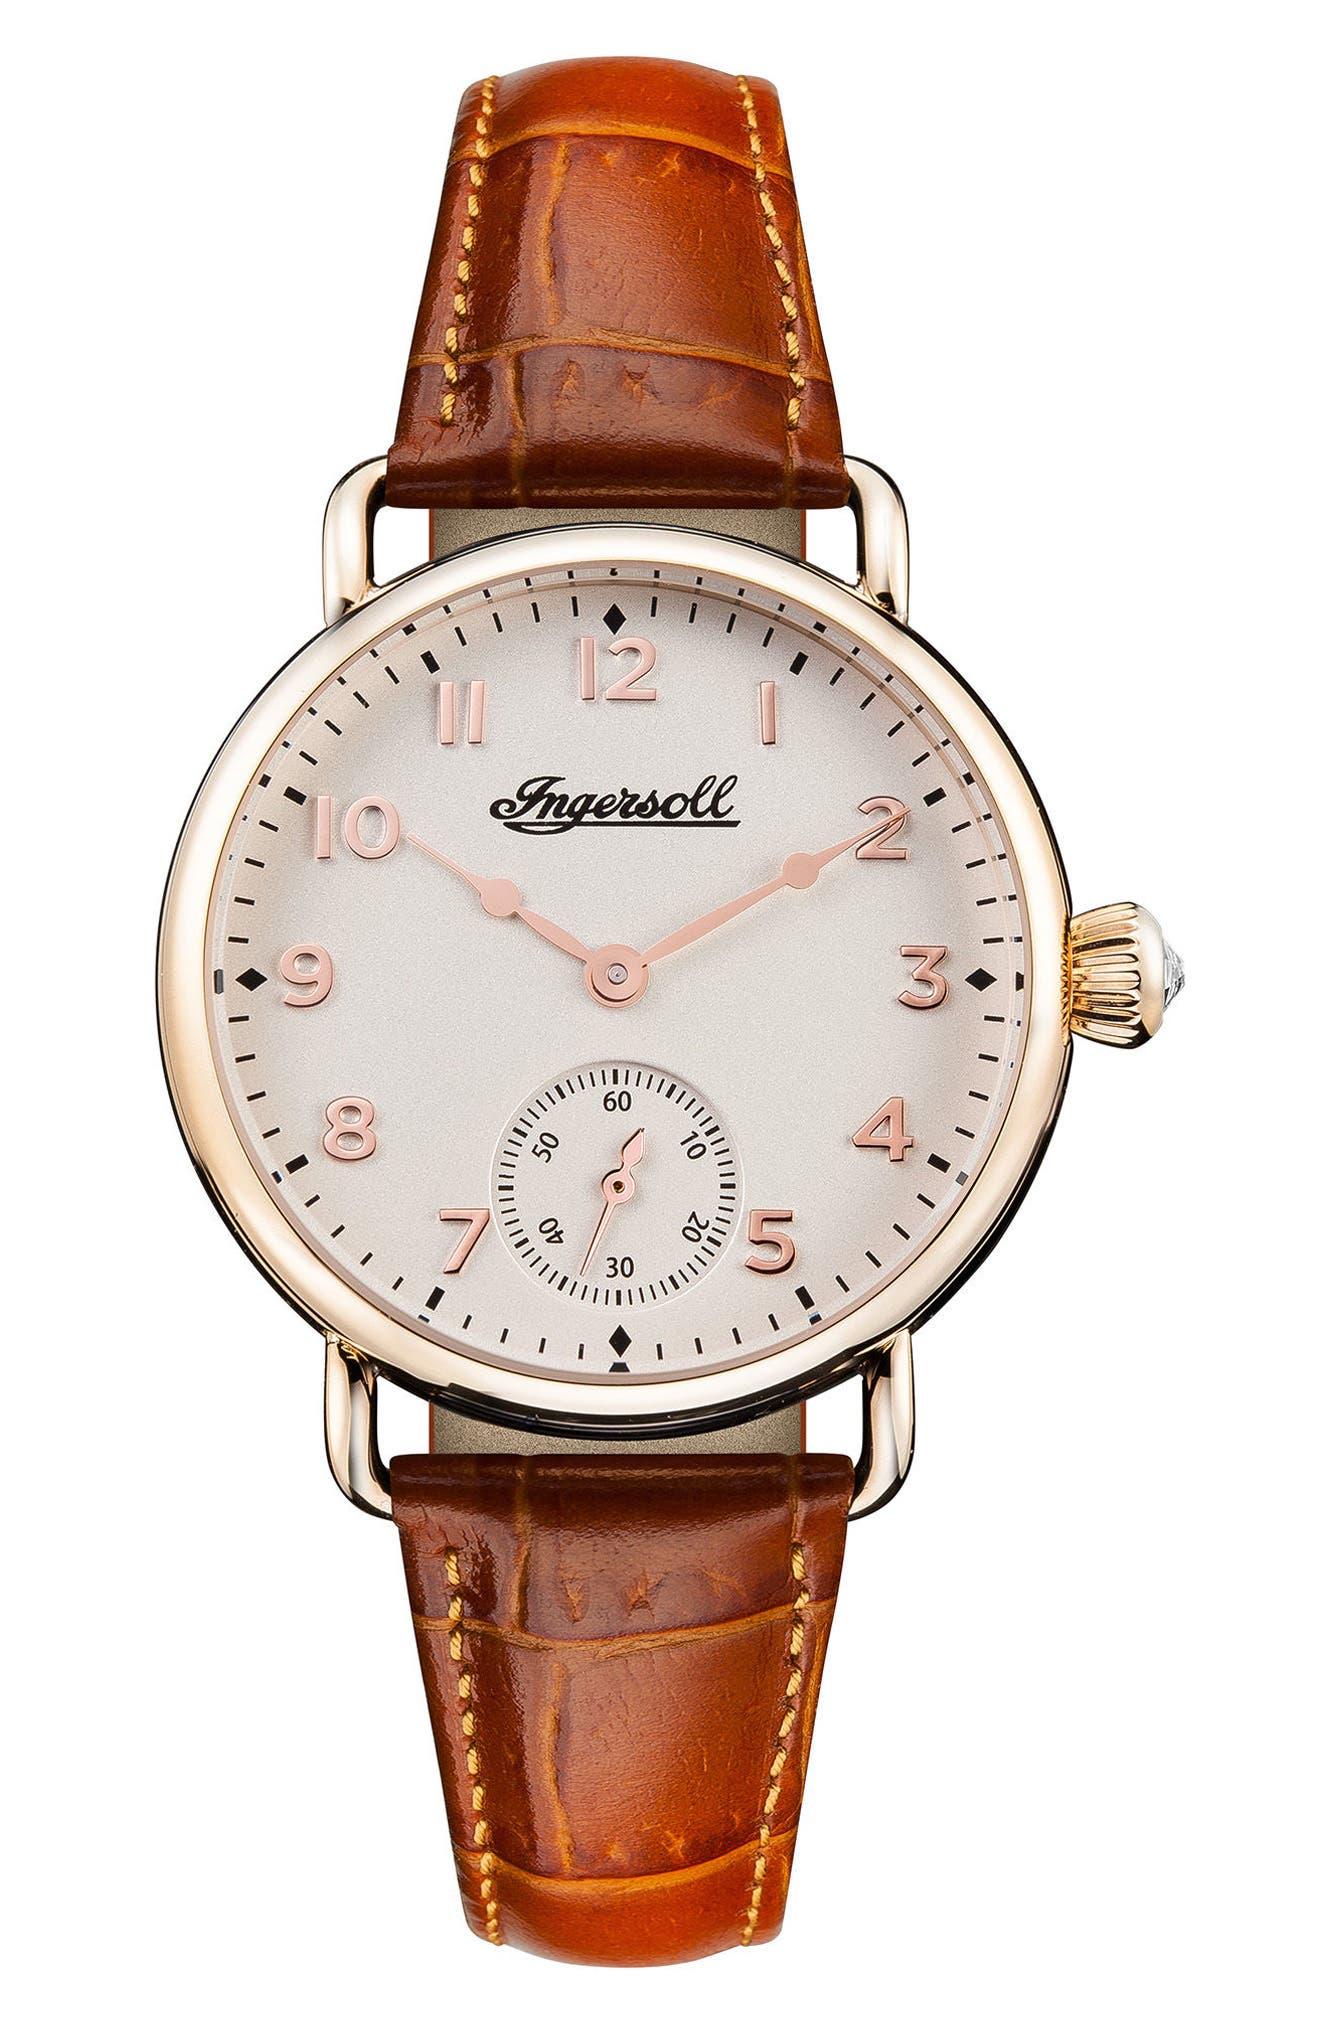 Main Image - Ingersoll Trenton Leather Strap Watch, 34mm